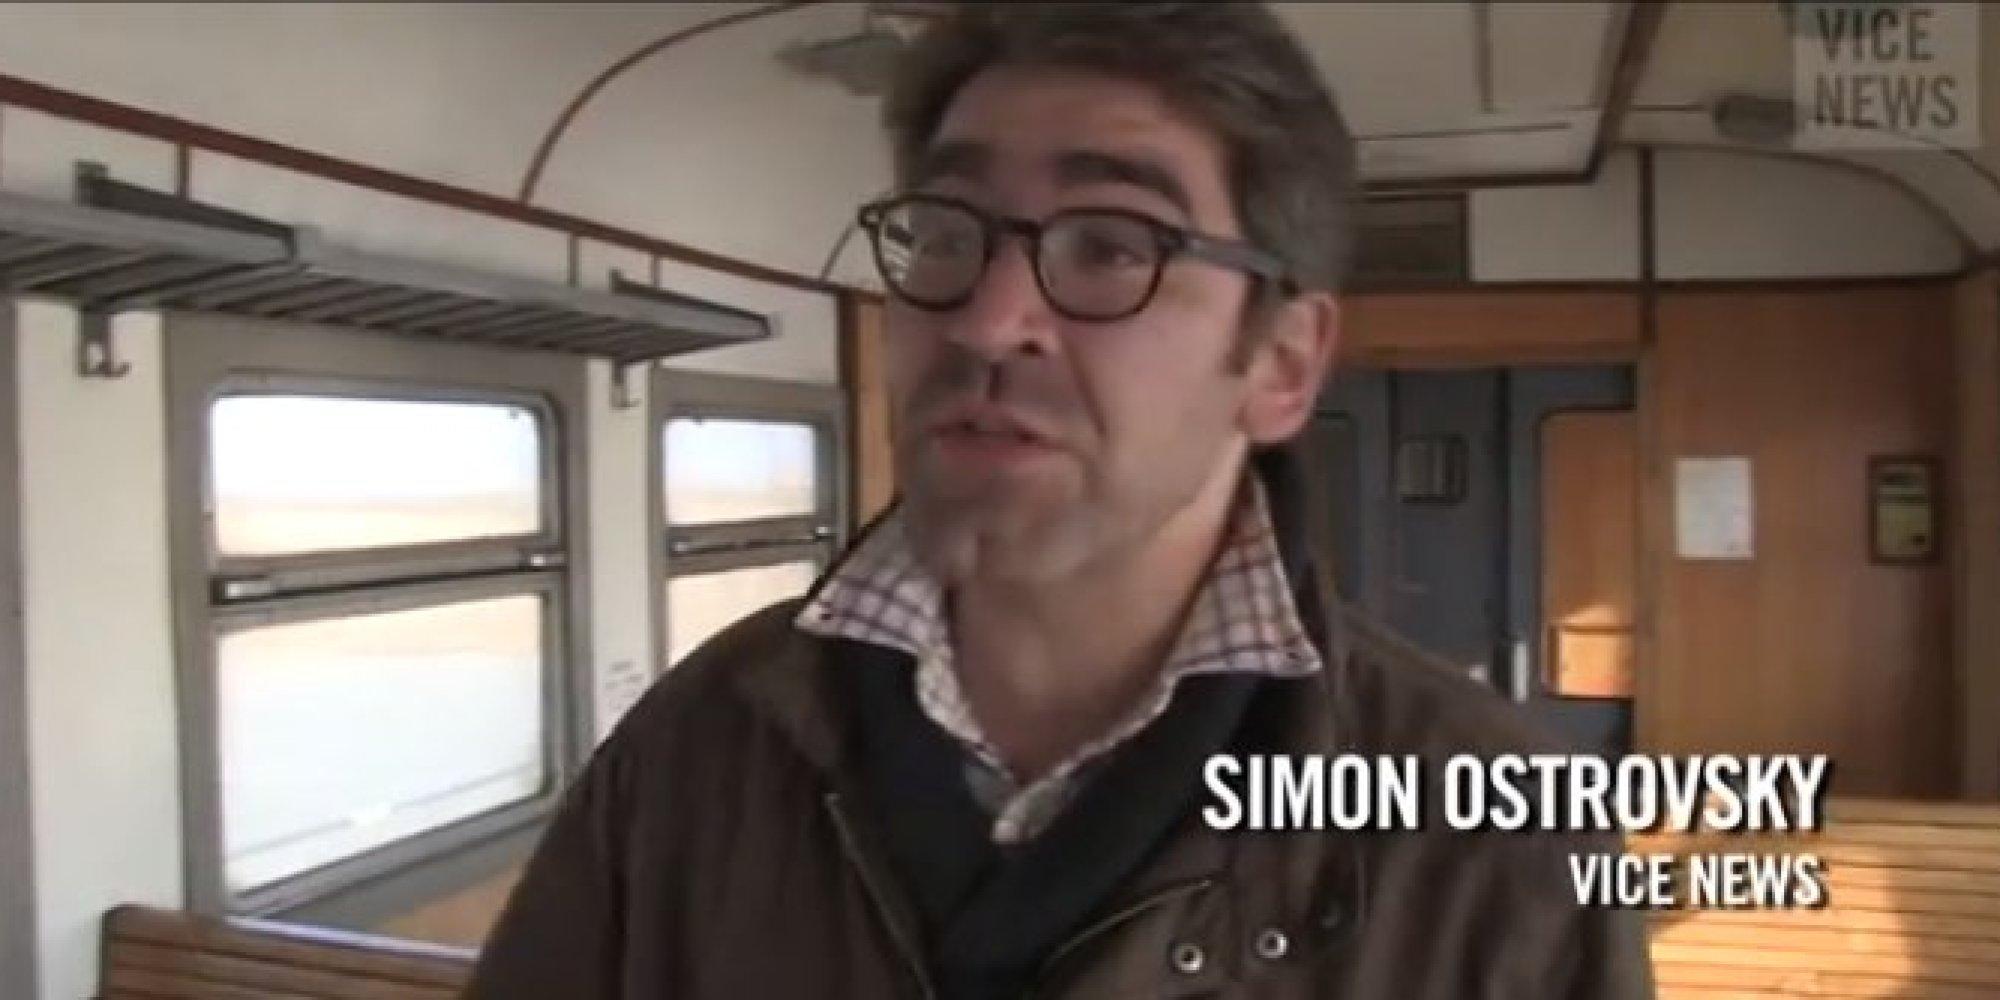 Vice Reporter Simon Ostrovsky Being Held In Eastern Ukraine | HuffPost